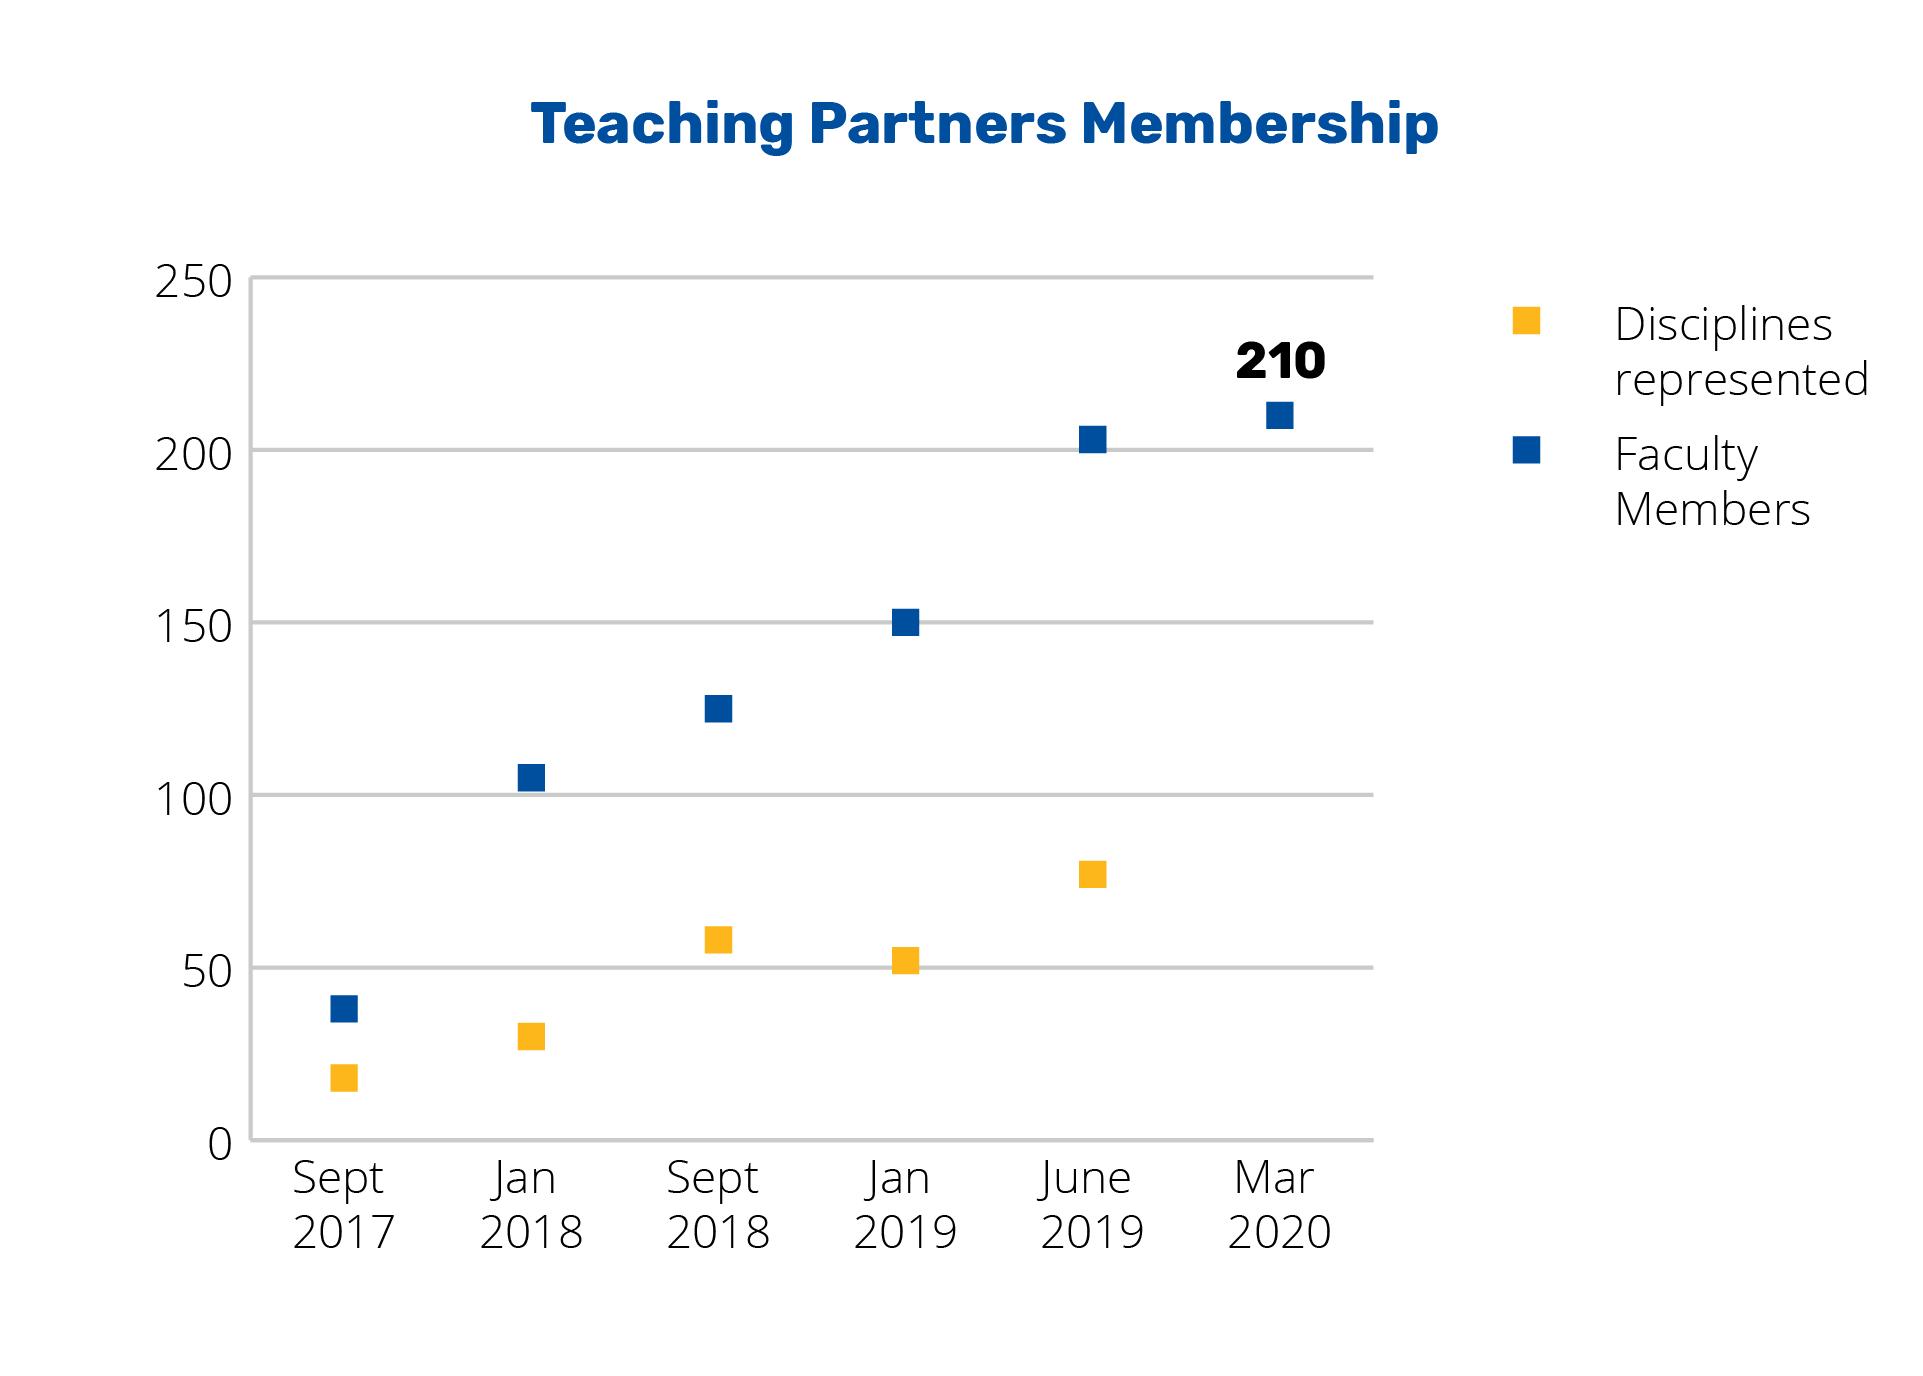 Annual Report 2020 - Teaching Partners Membership